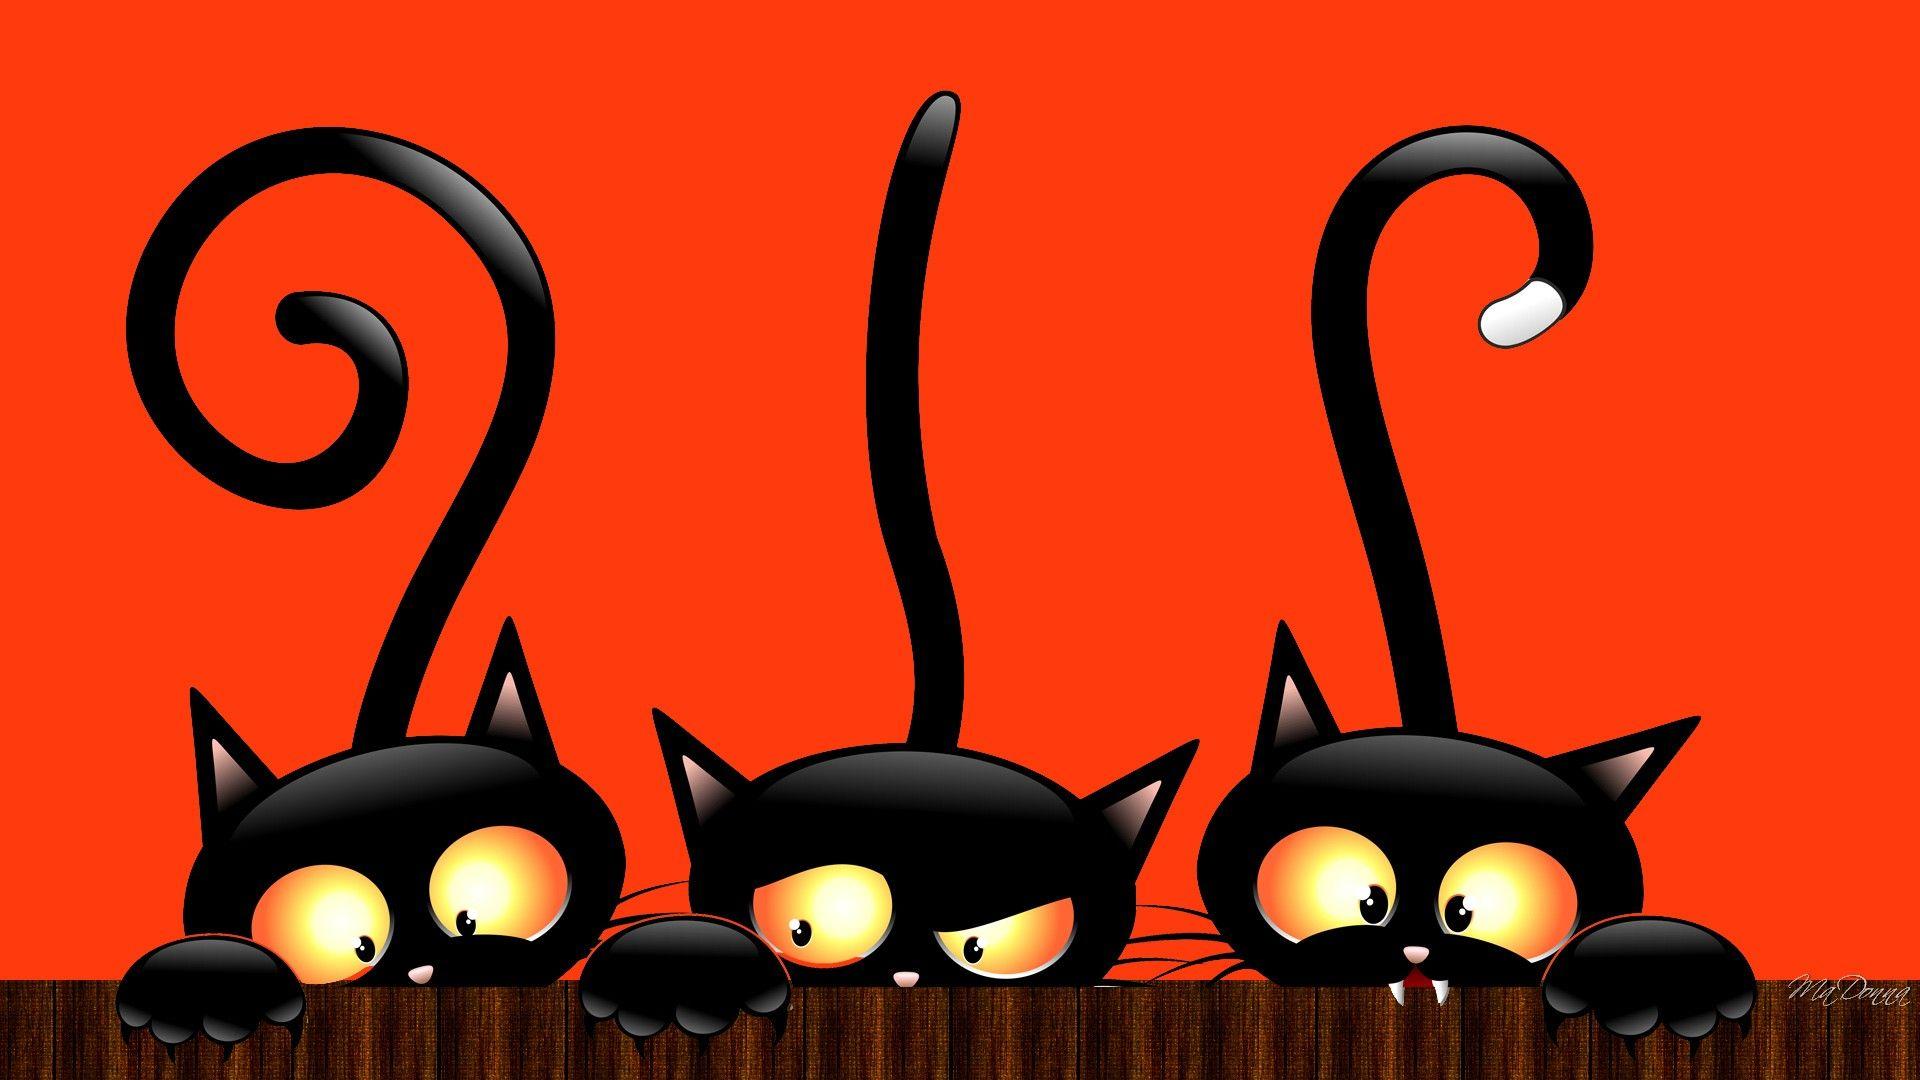 Cute Halloween Desktop Wallpapers   Top Cute Halloween 1920x1080